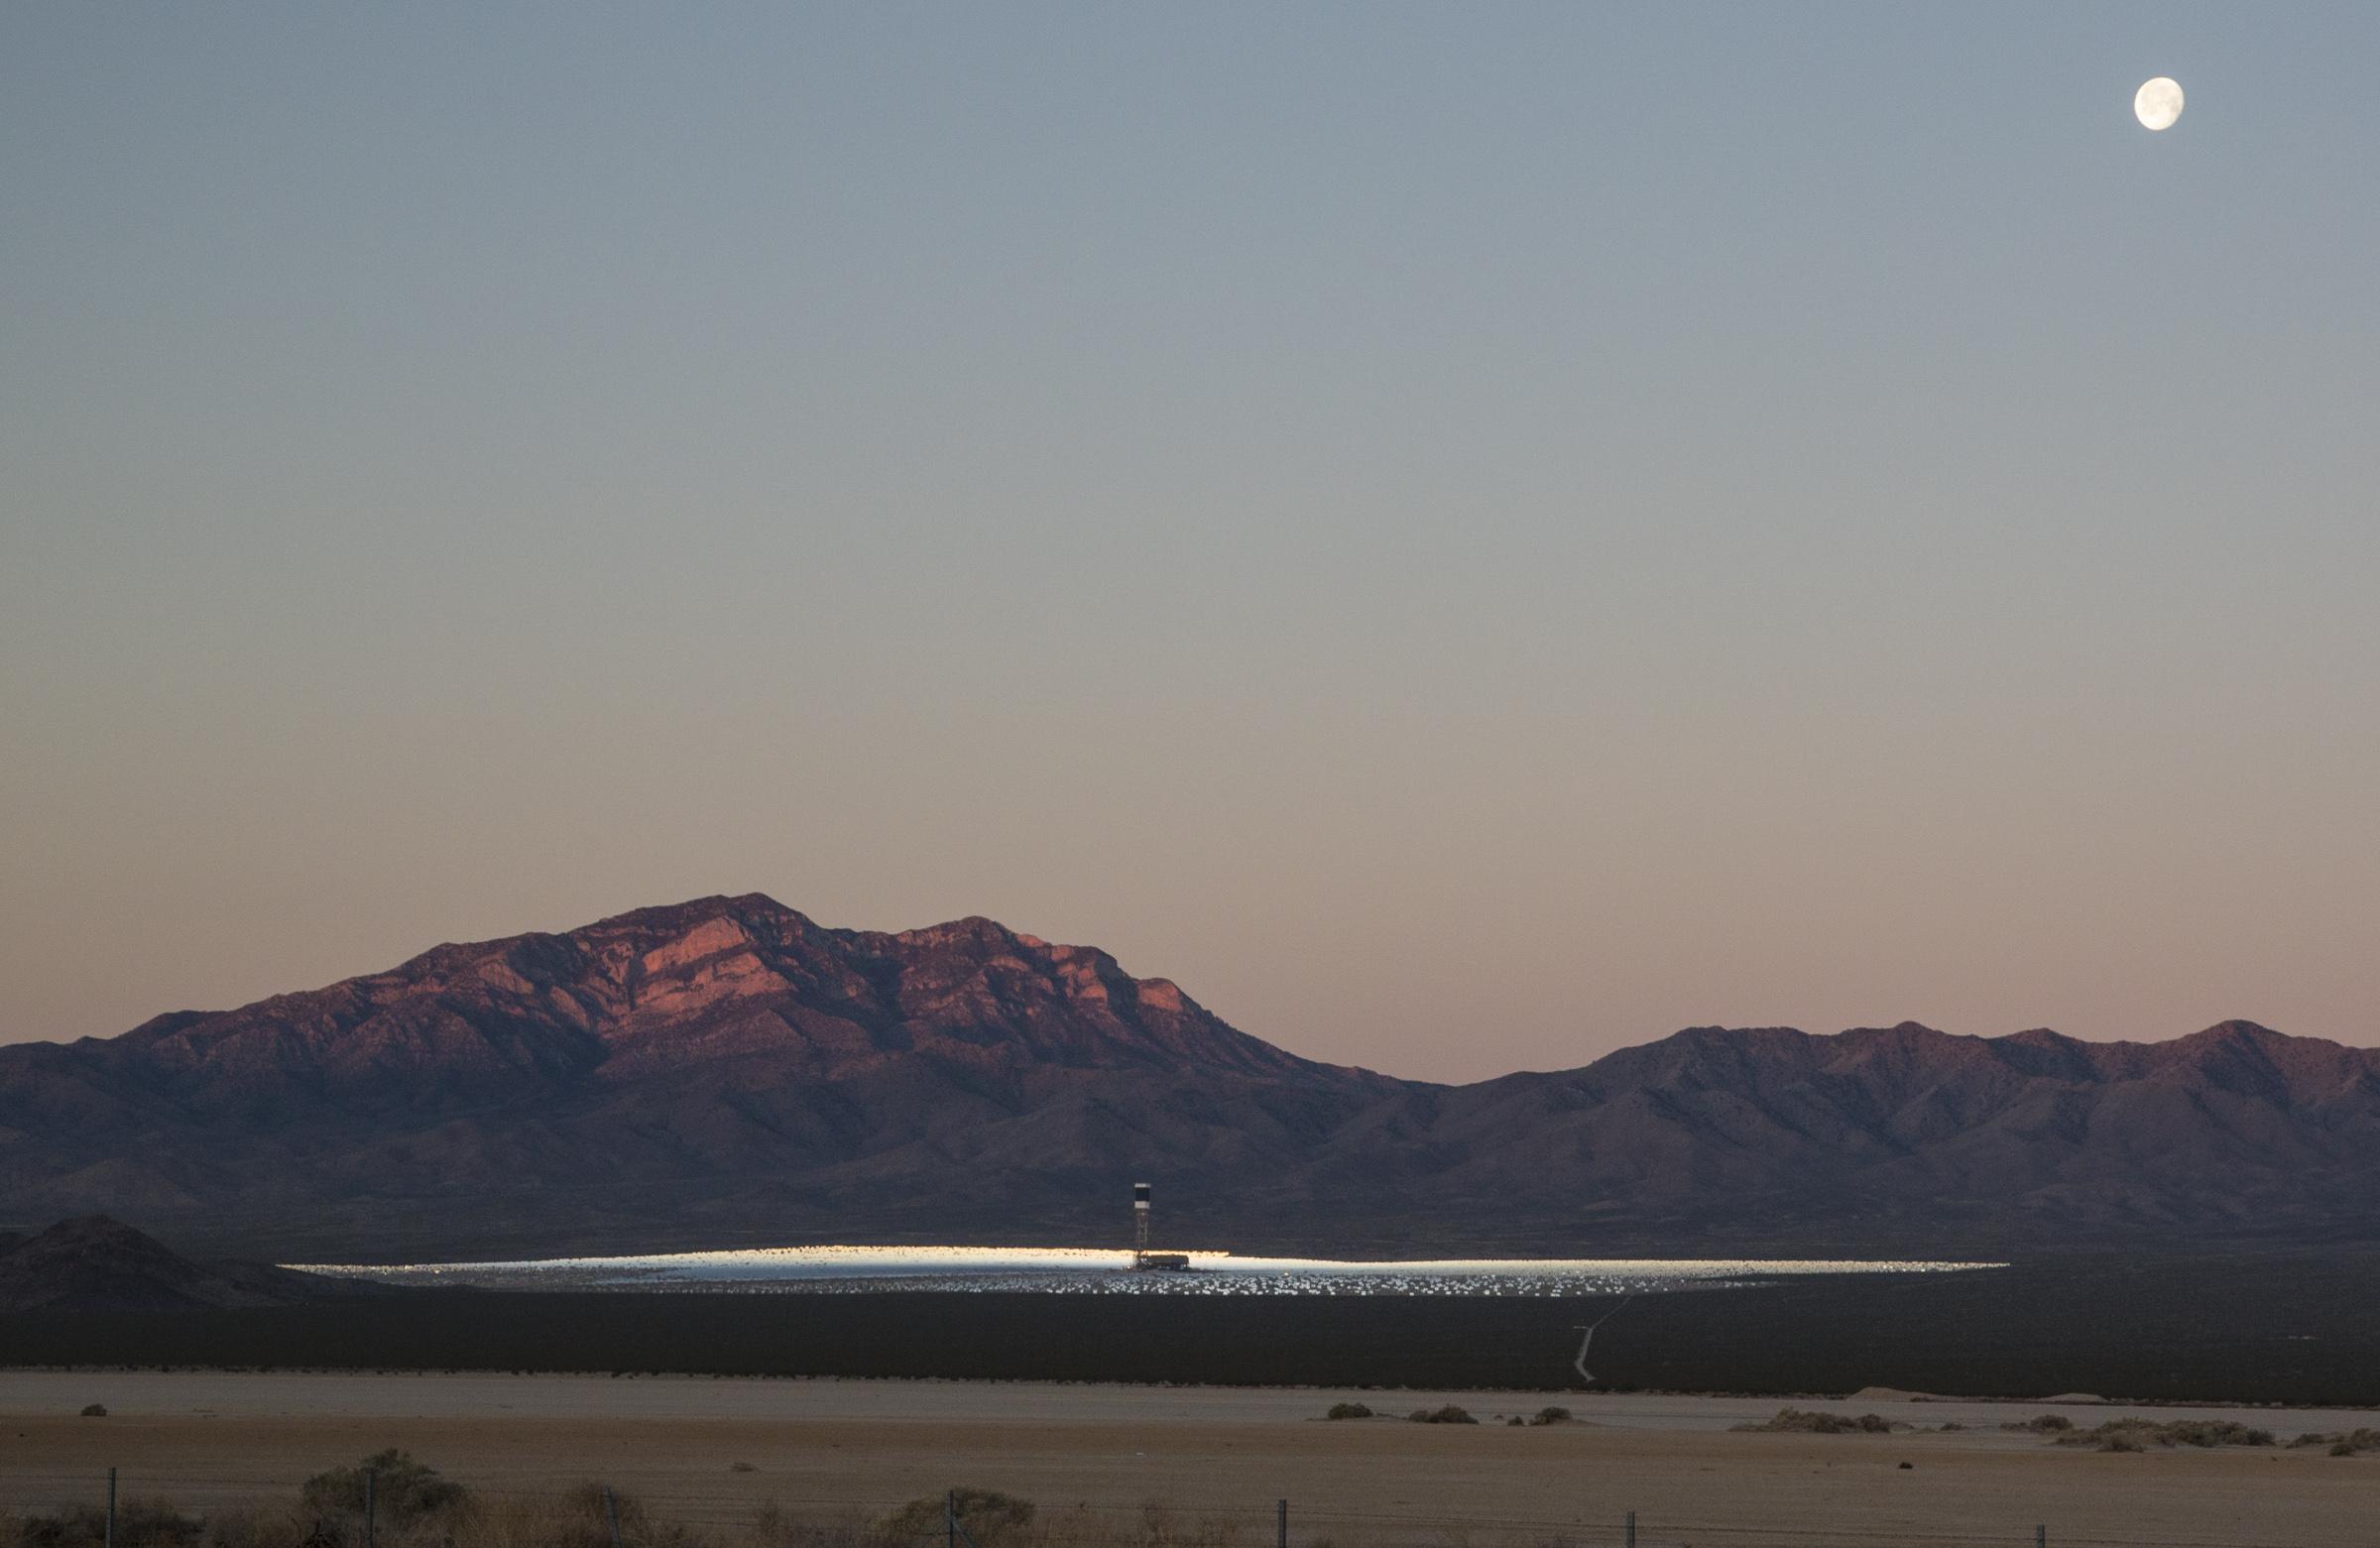 Ivanpah solar facility in Nevada. Photo by Bob Wick, BLM